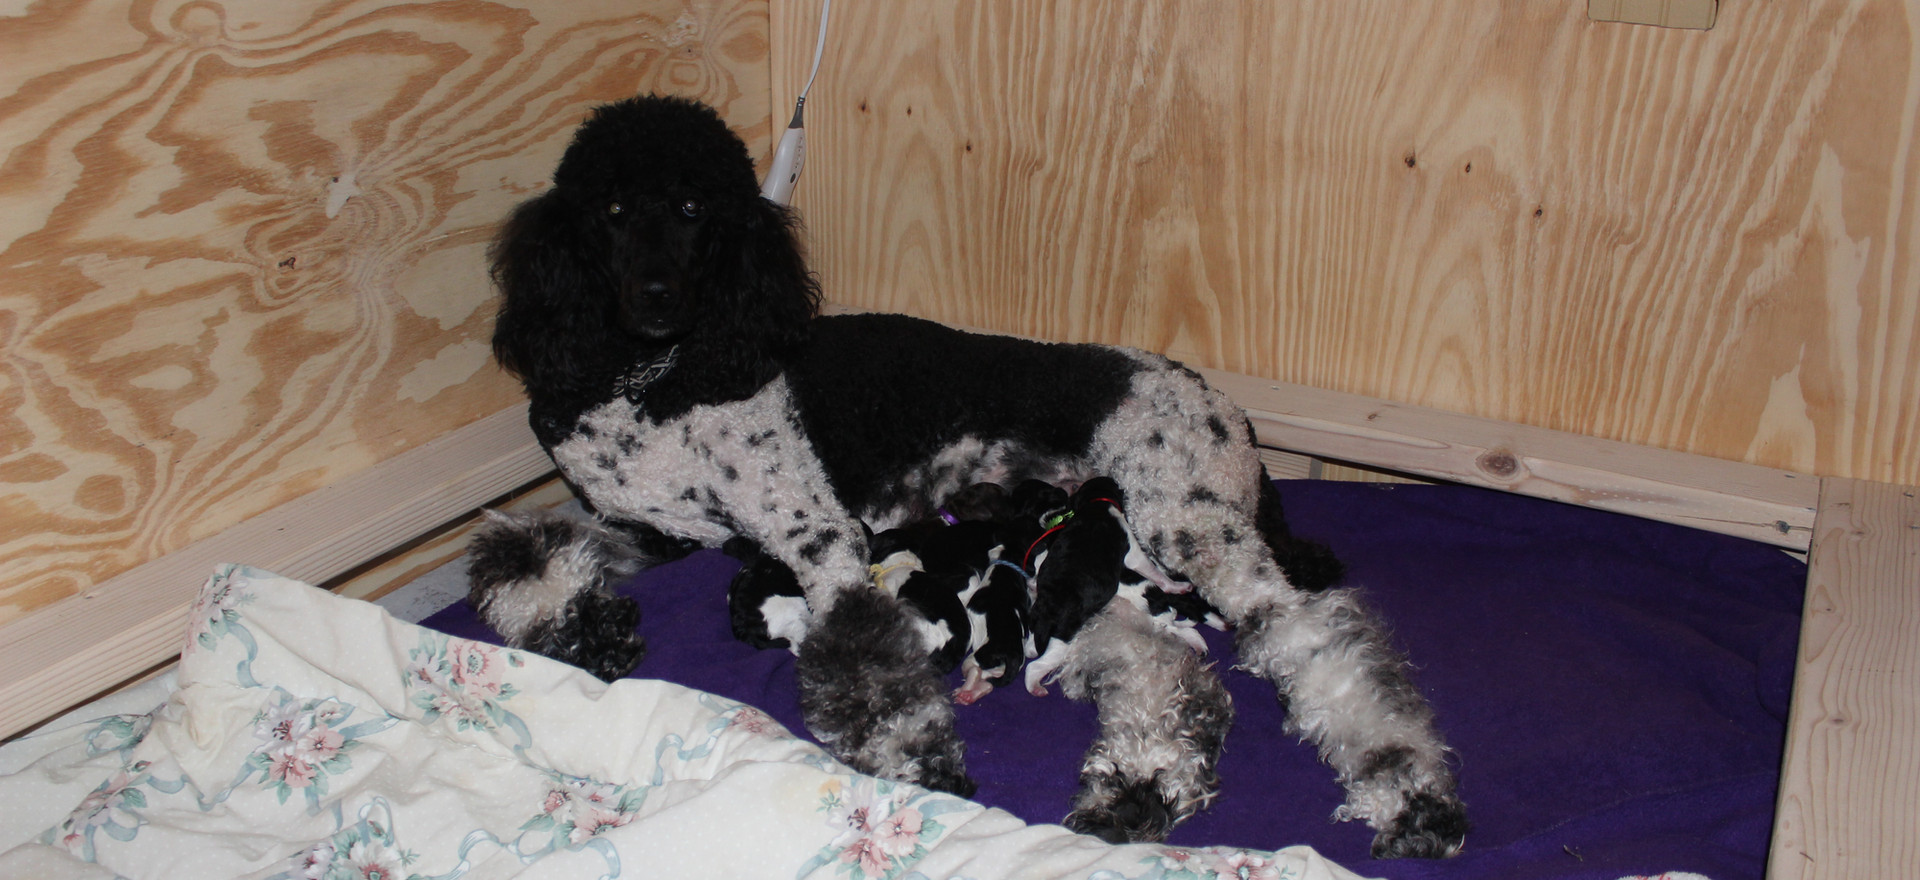 Tilly enjoyed motherhood.